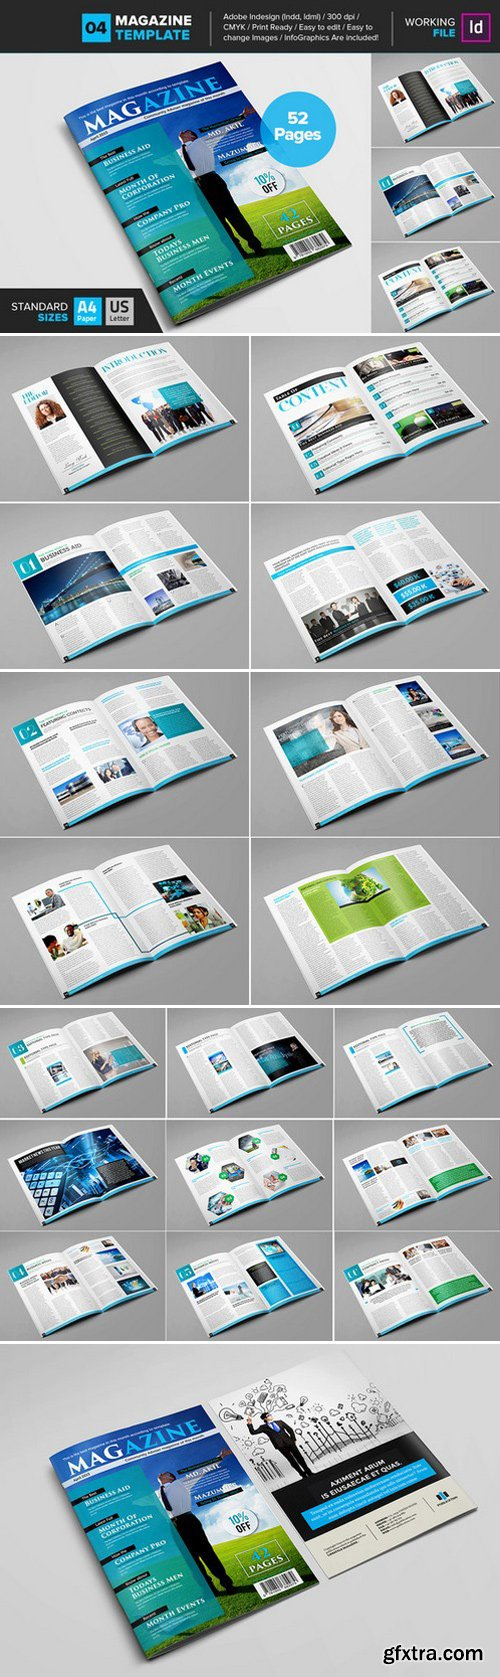 CM - Magazine Template 04 437838